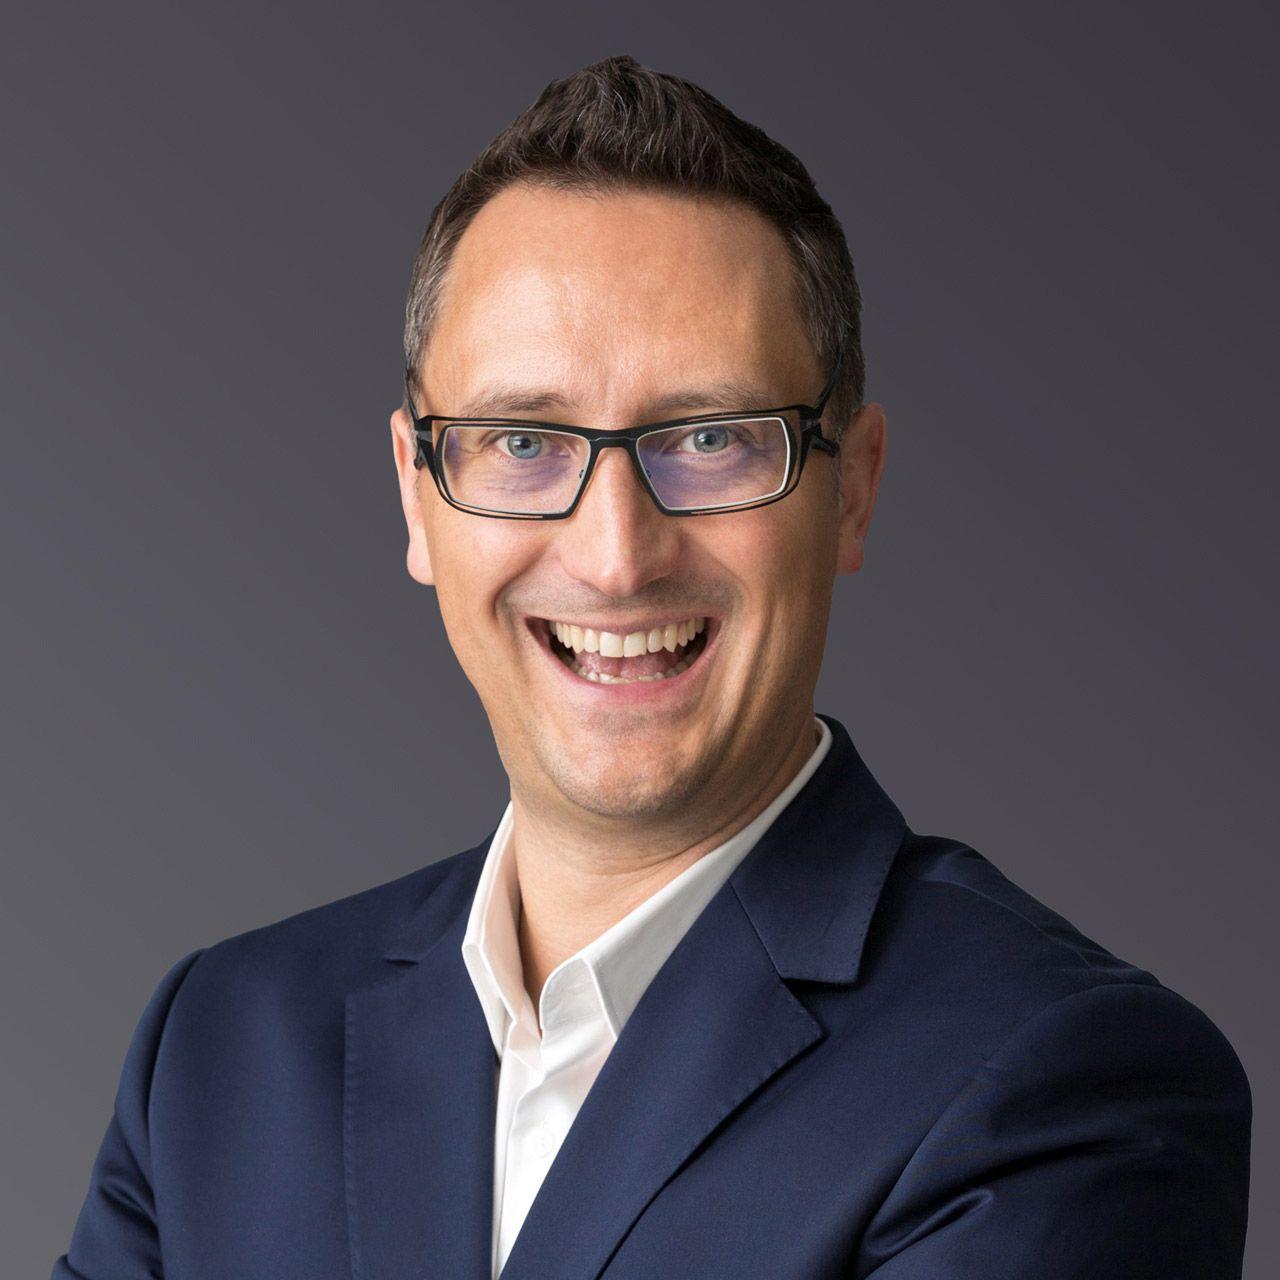 Profile photo of Steffen David, Advisor at Bregal Milestone